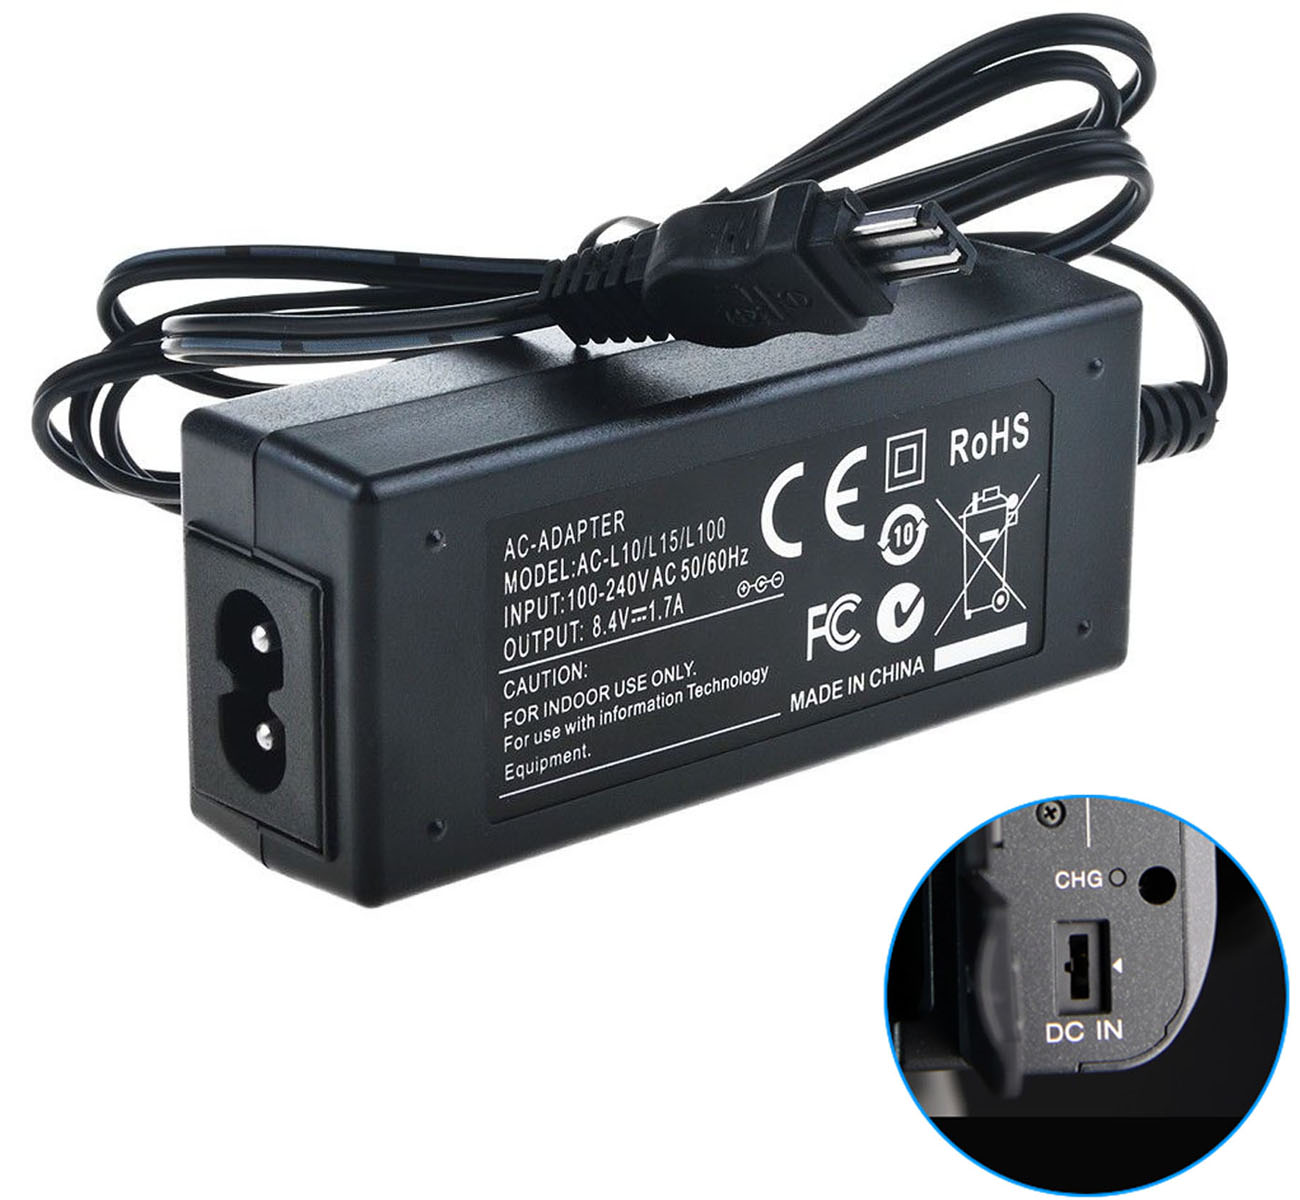 MVC-CD250 MVC-CD300 AC Power Adapter Charger for Sony MVC-CD200 MVC-CD350 Mavica Digital Camera